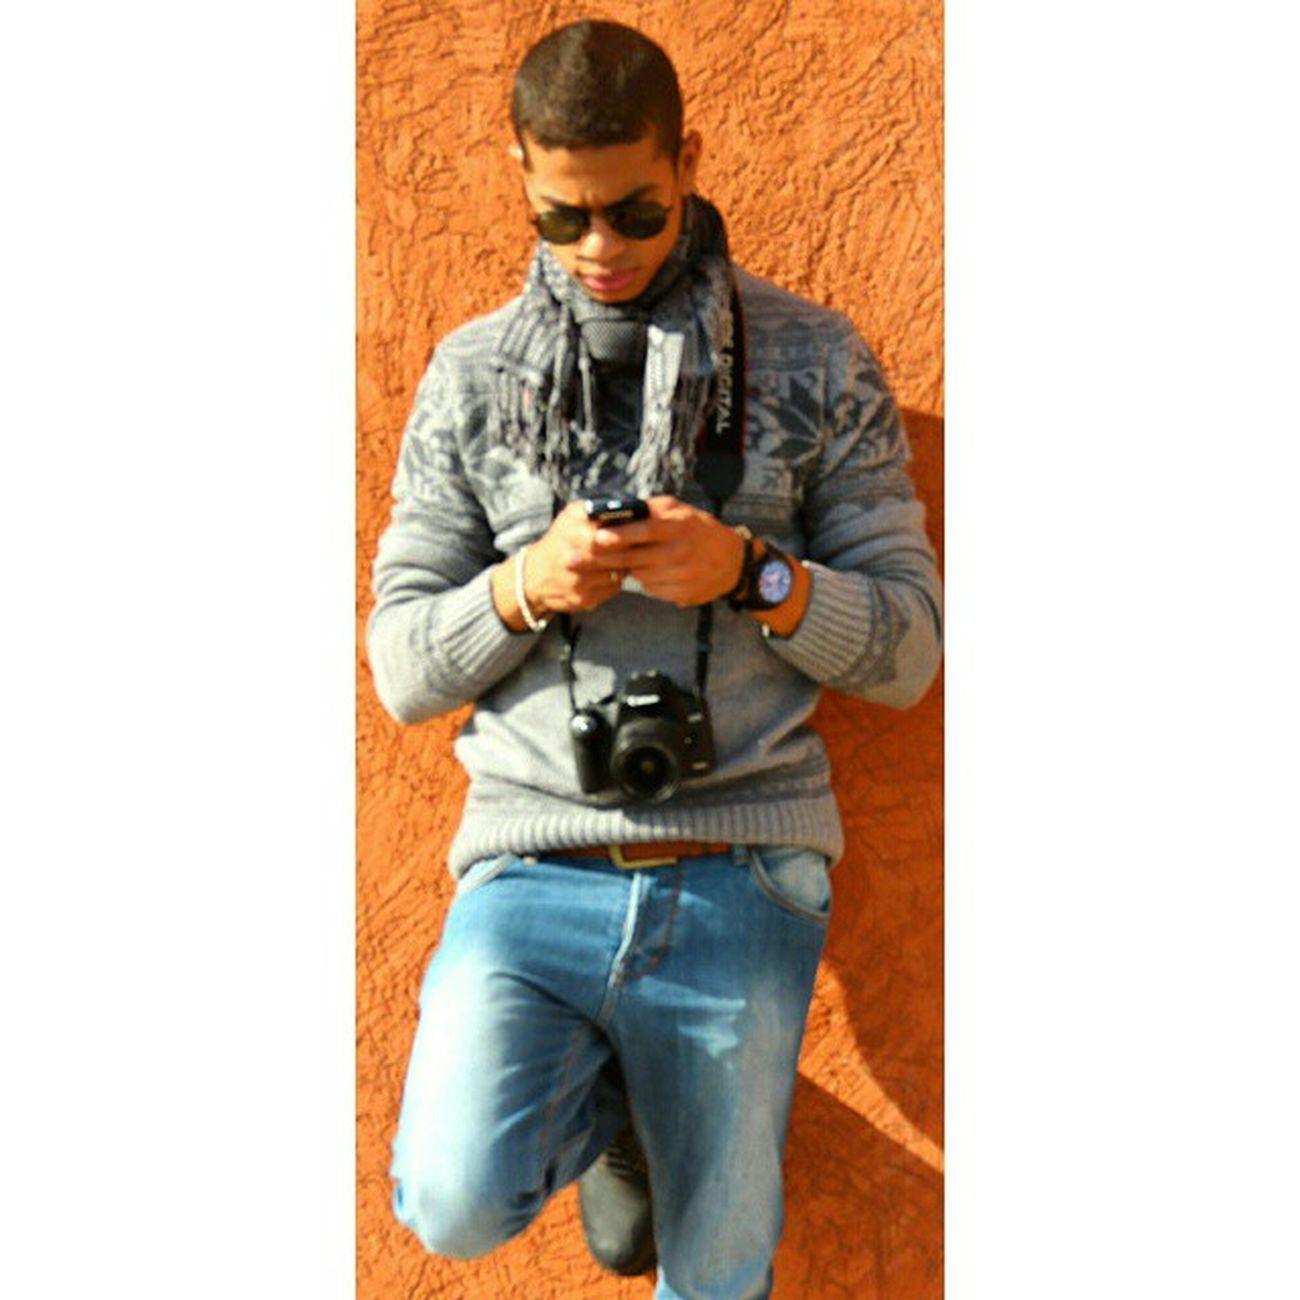 Photogrid